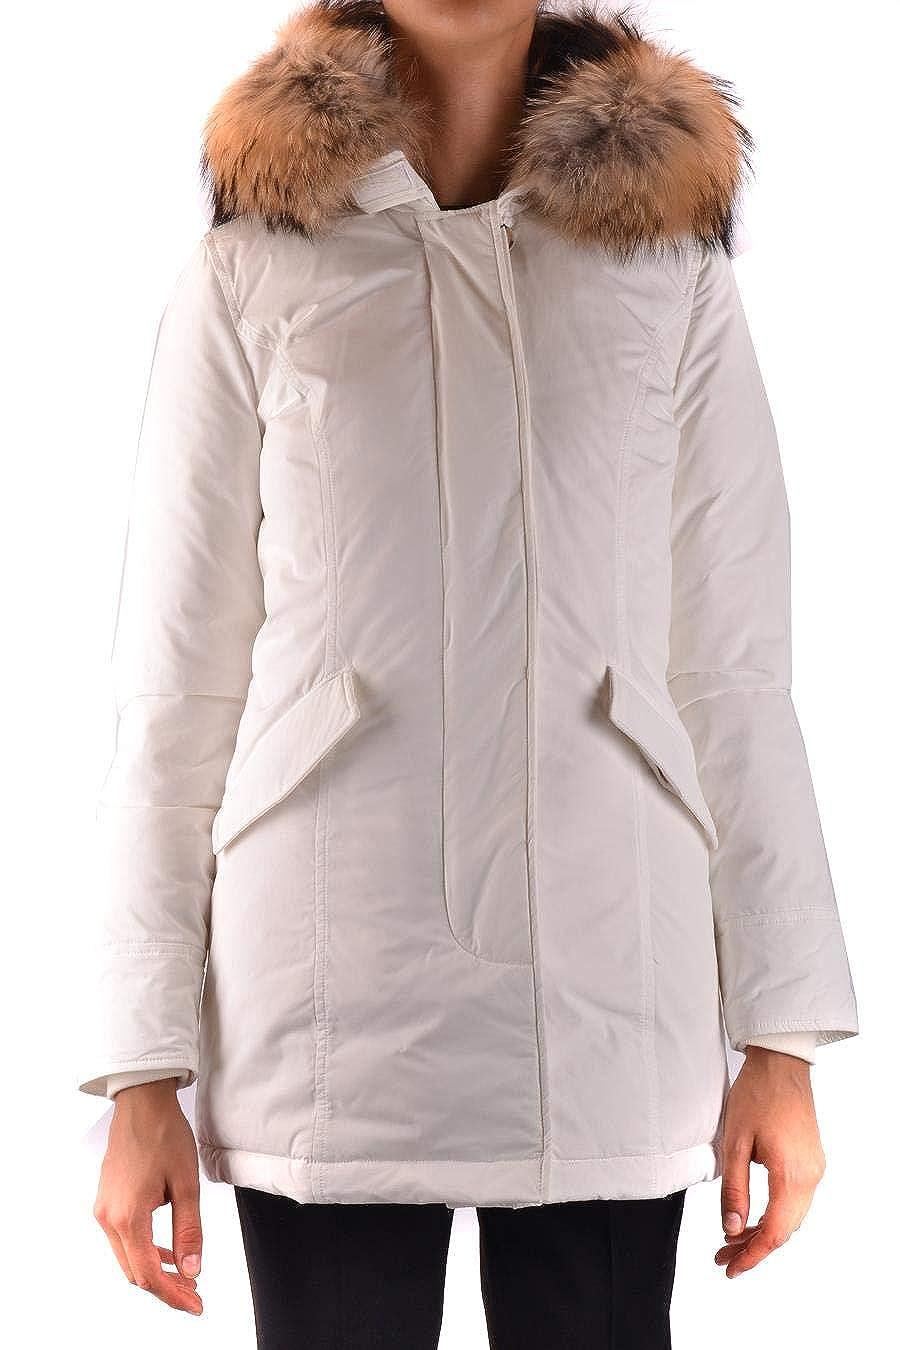 Wwcps2604cf408270 Femme Blanc Woolrich Manteau Polyamide wPUxqvp